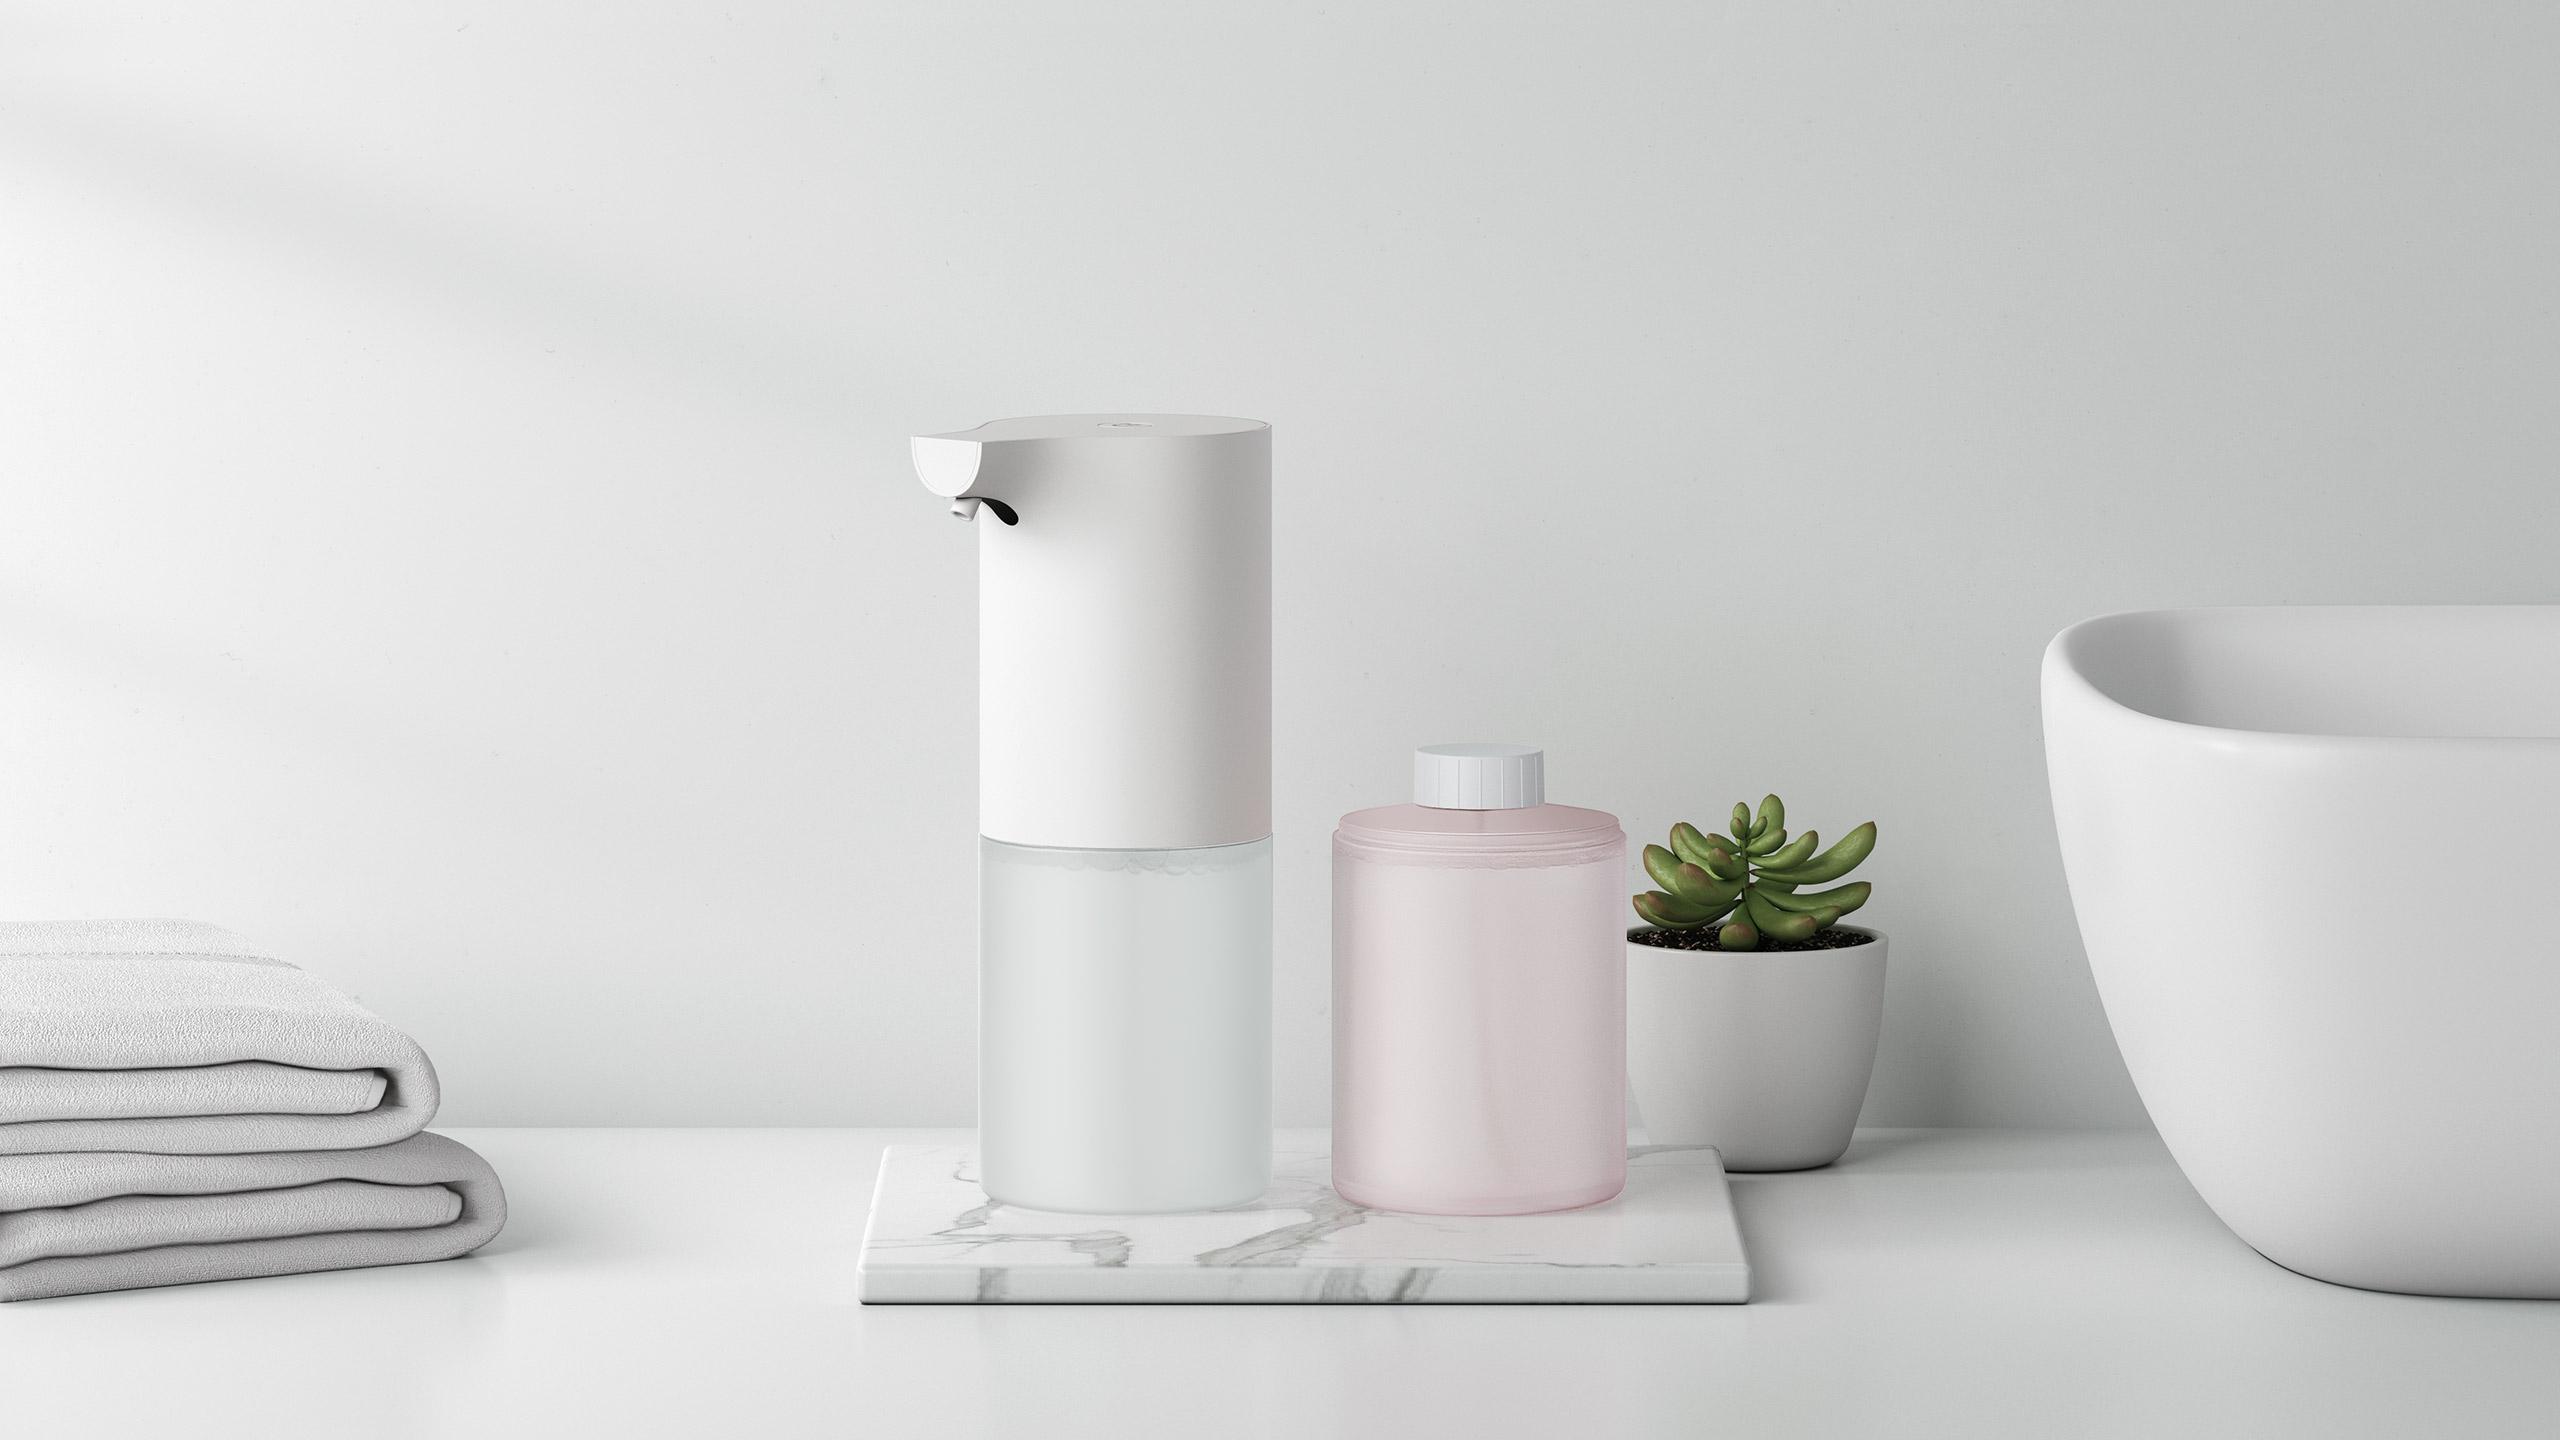 Дозатор Xiaomi Mijia SimpleWay Automatic Foam Soap Dispenser 4